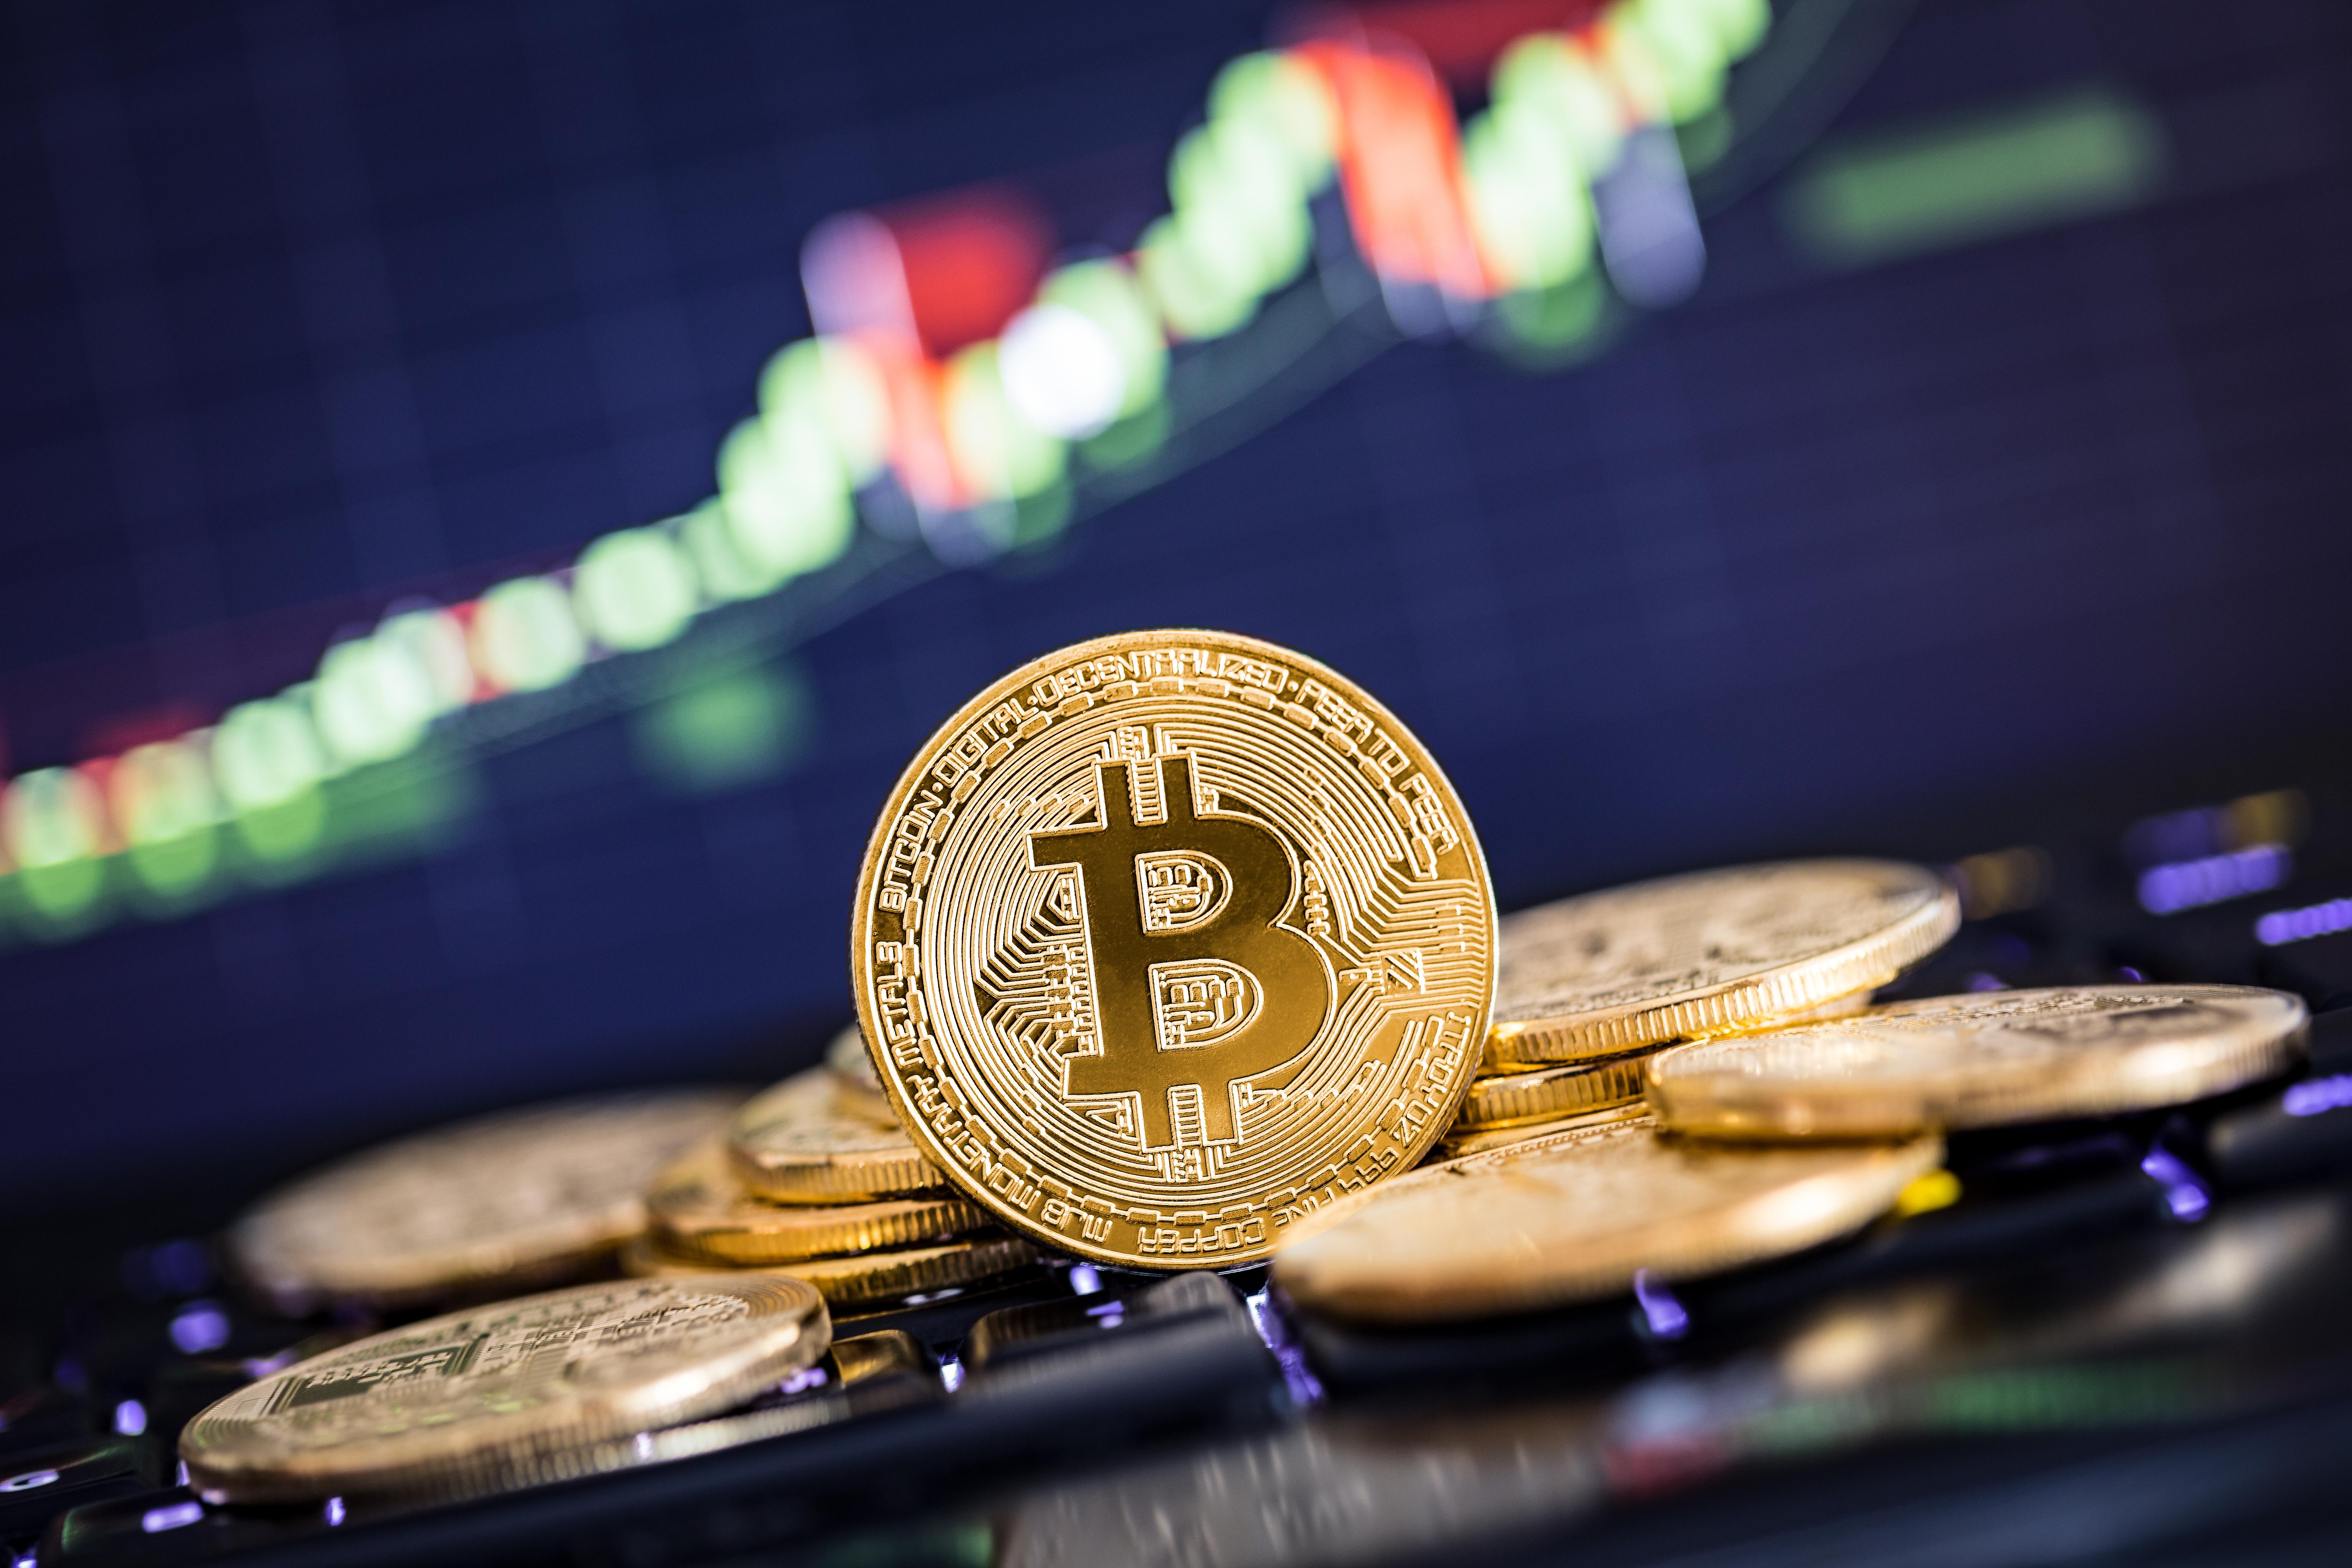 A Bitcoin token set against a falling graph